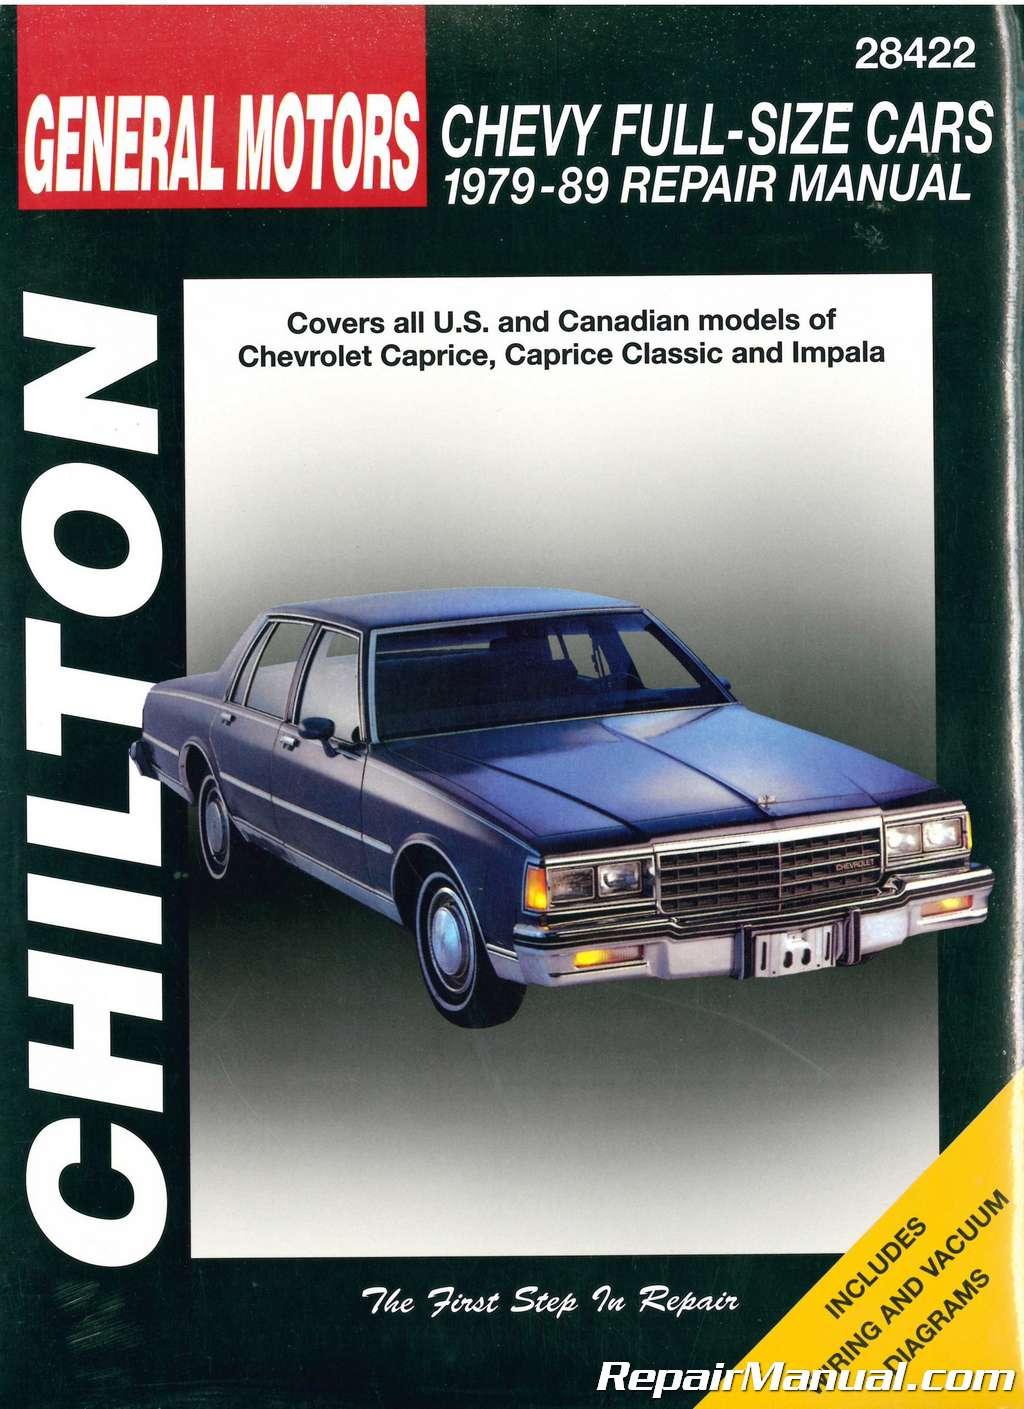 Chilton Chevrolet Full-Size Cars 1979-1989 Repair Manual